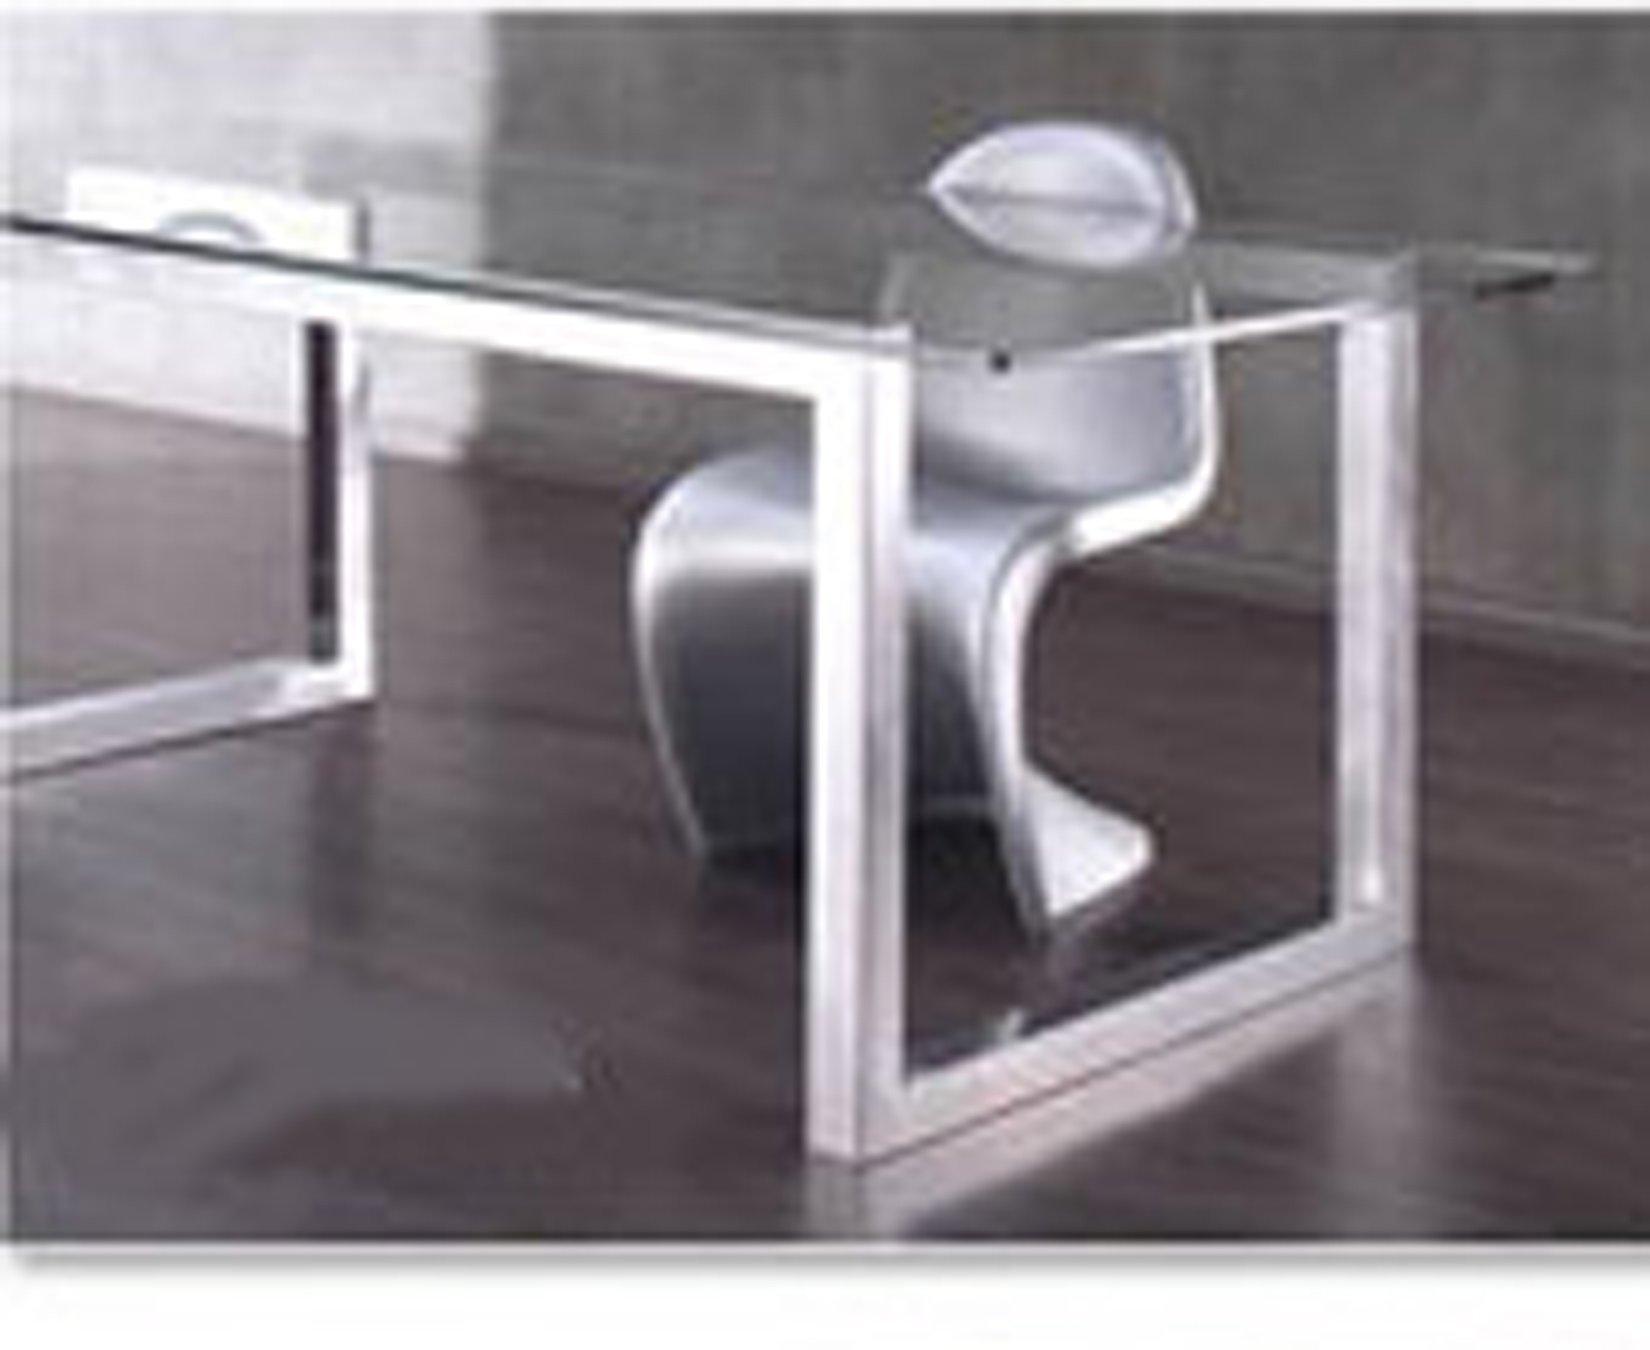 Mesa aster acero inoxidable cristal car interior design for Mesa cristal acero